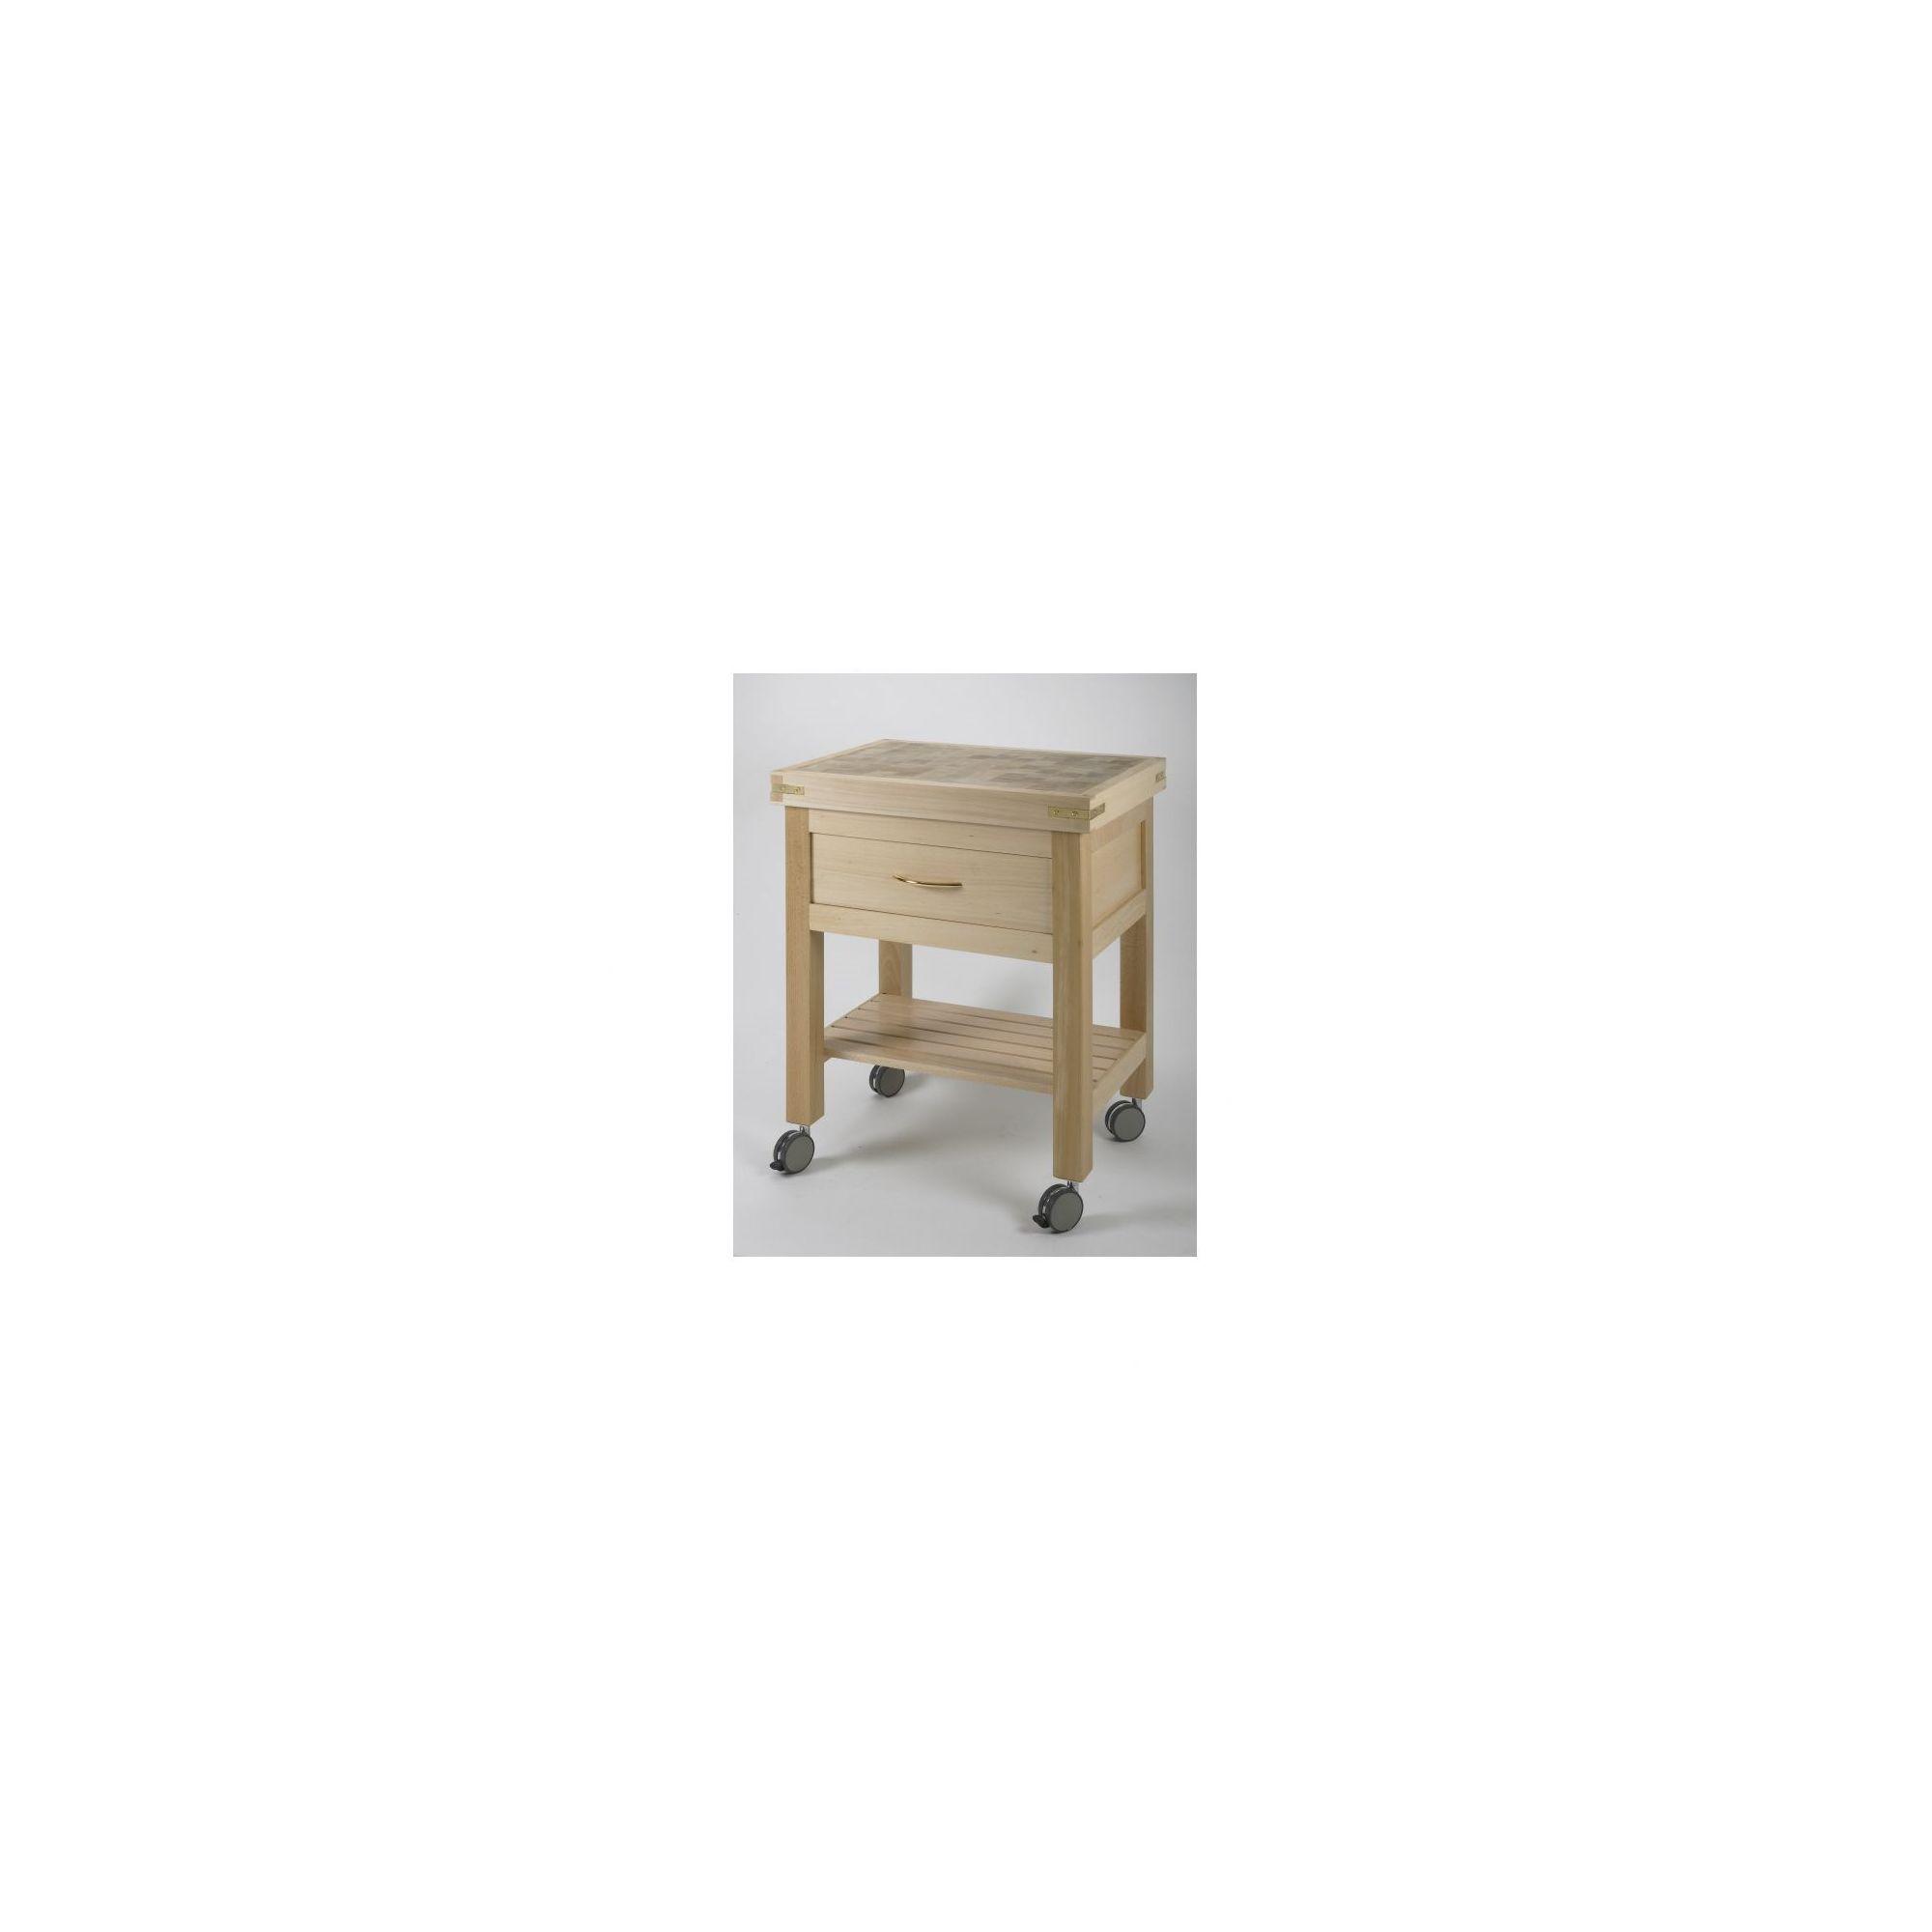 Chabret Kitchen Cart - 90cm X 50cm X 50cm at Tescos Direct